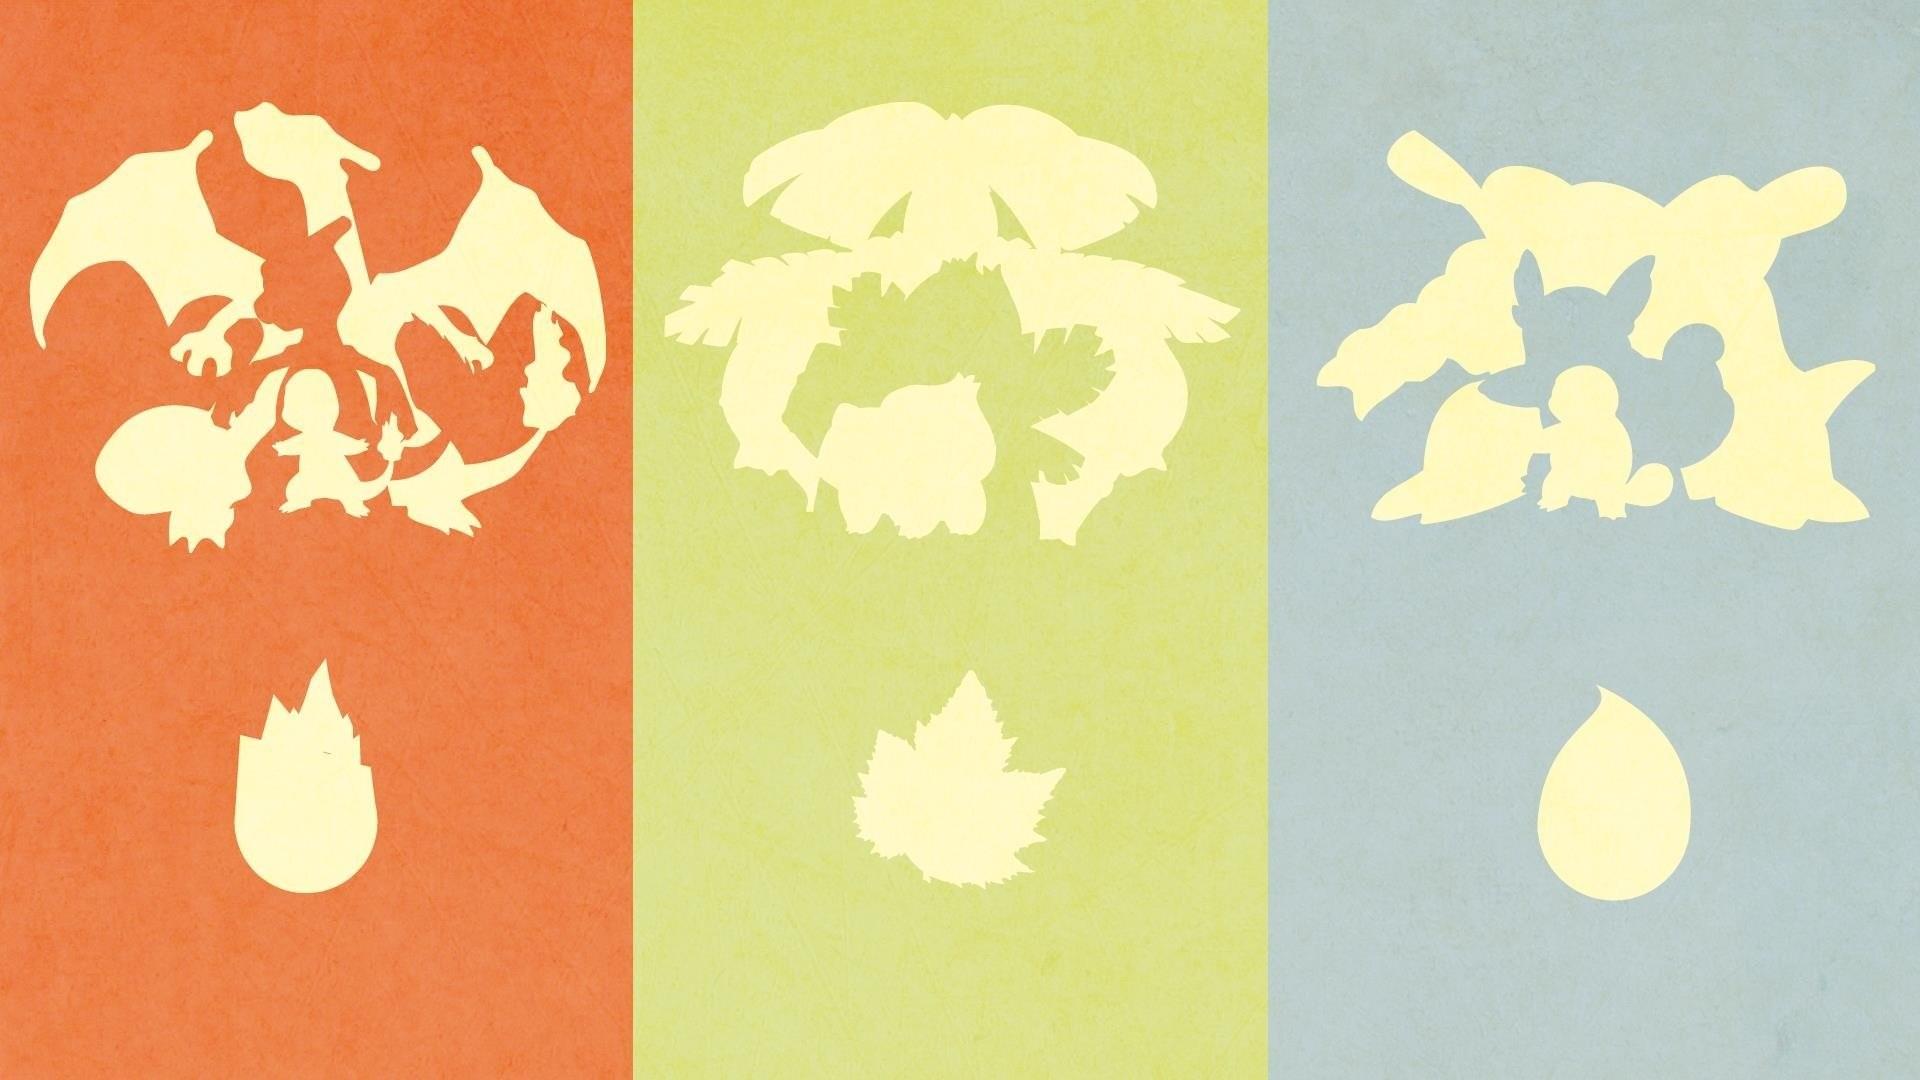 Chikorita Grass Pokémon Starter Pokemon · HD Wallpaper | Background  ID:523534